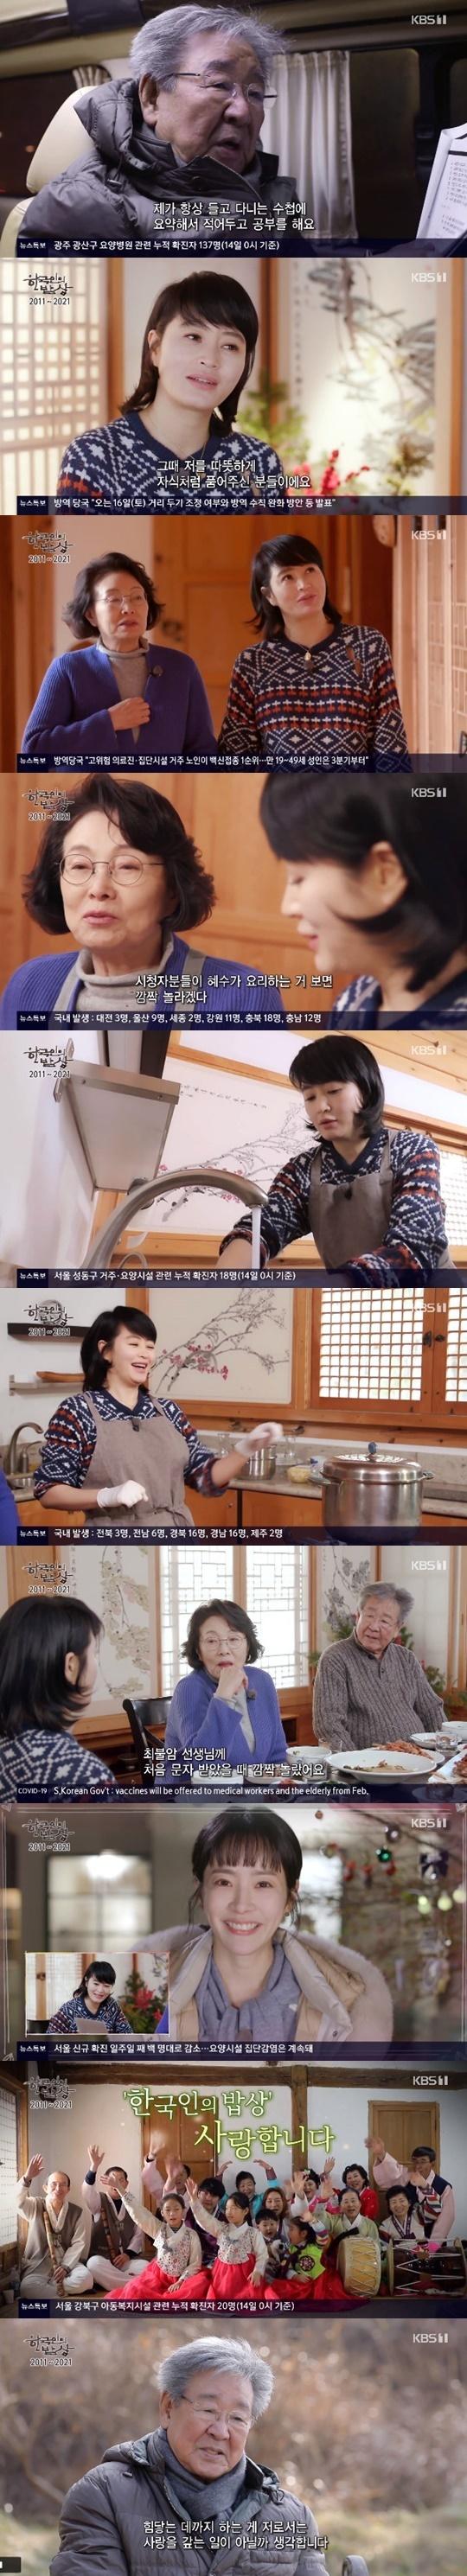 KBS 1TV '한국인의 밥상' © 뉴스1